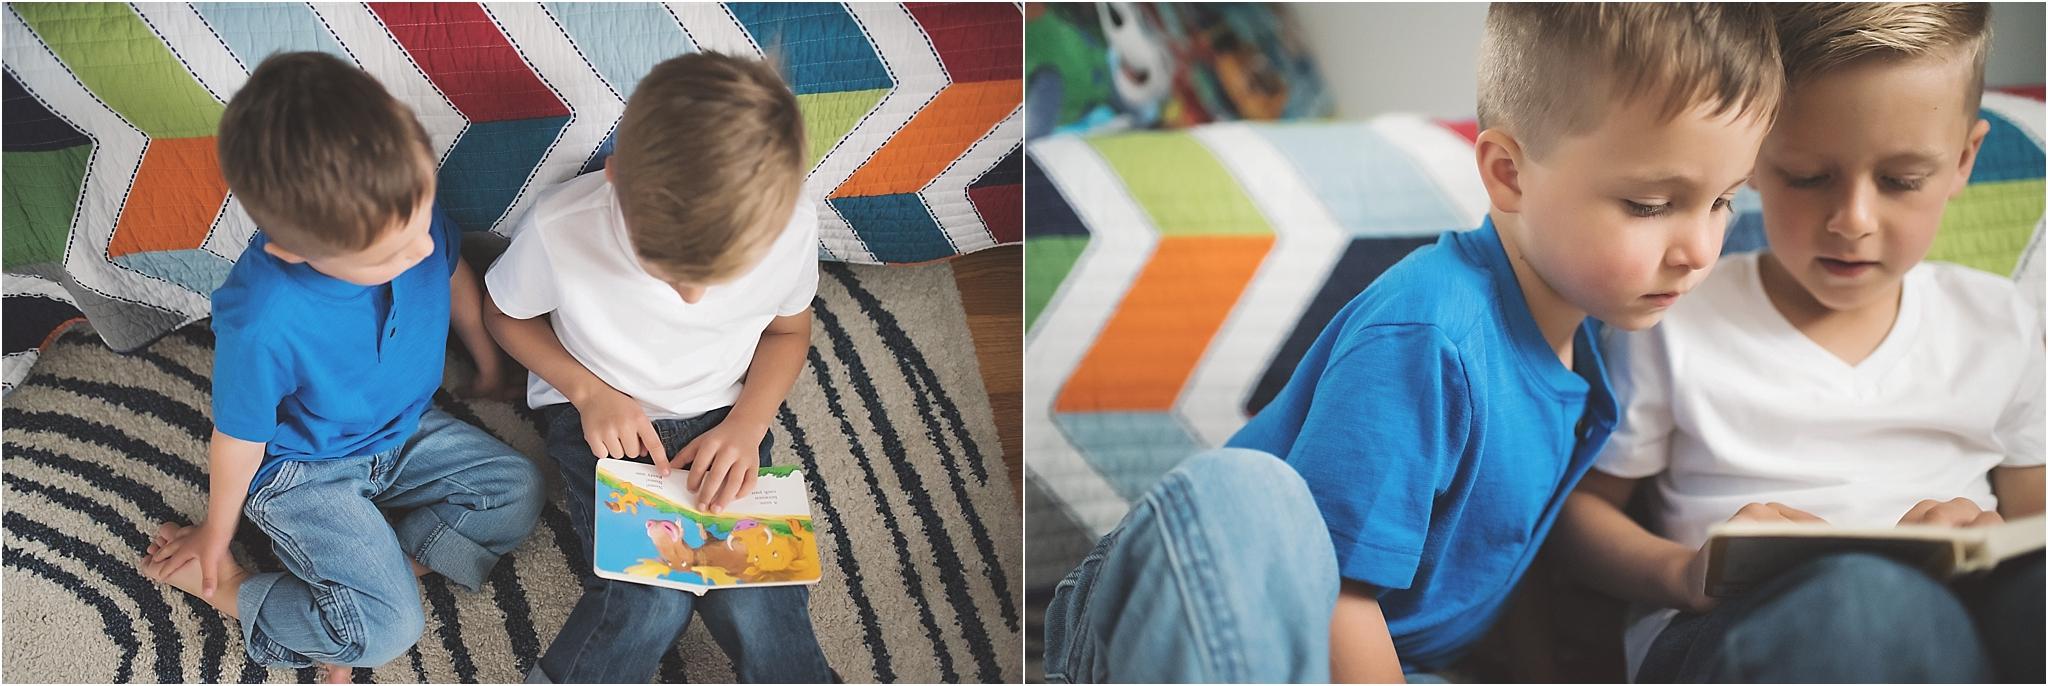 karra lynn photography - family lifestyle photographer michigan - brothers reading